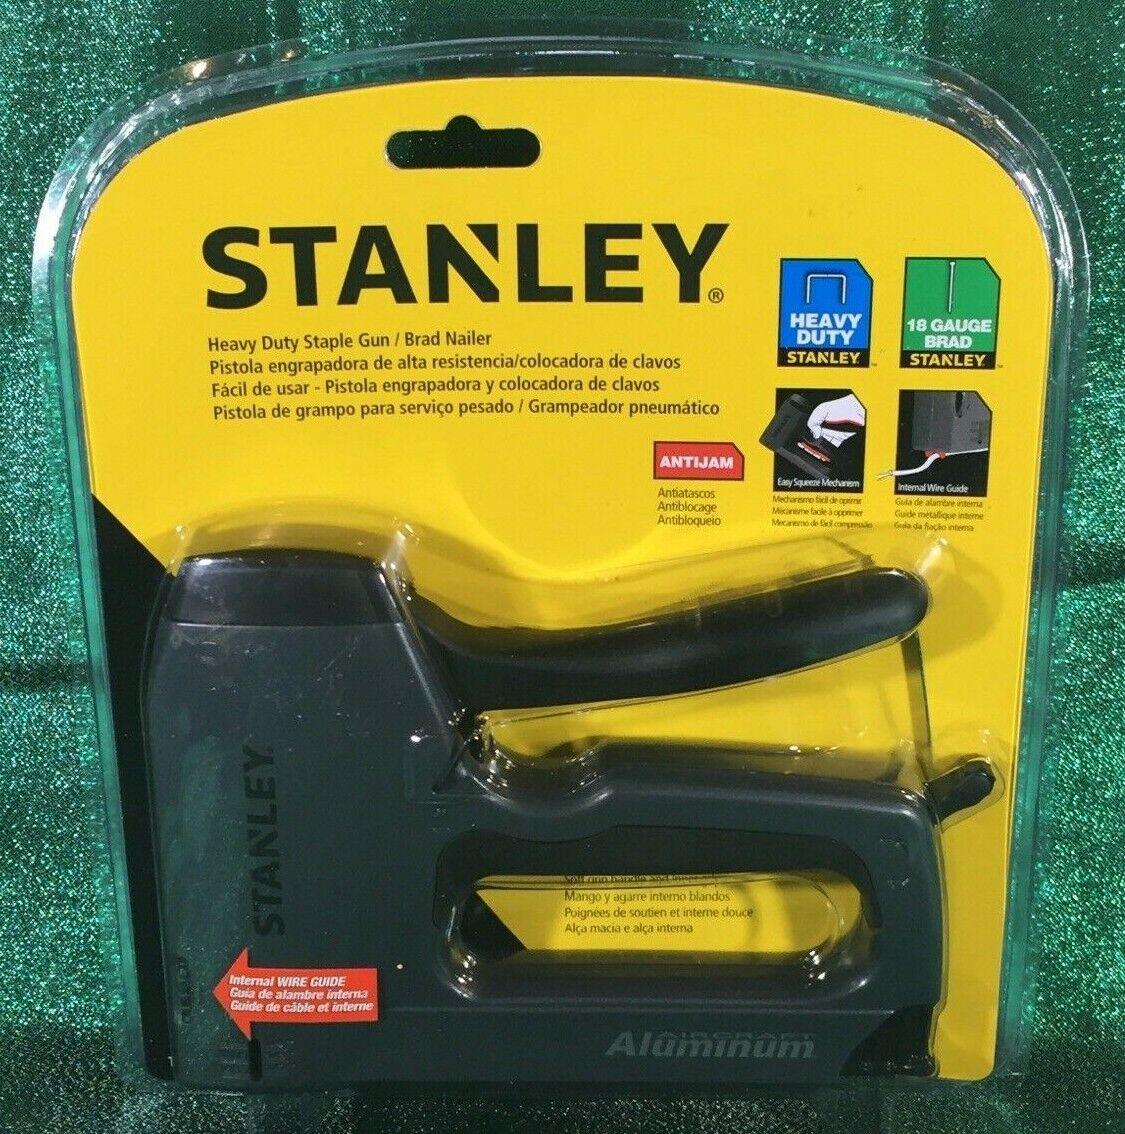 STANLEY TR250 Heavy-Duty Aluminum Staple Gun / Brad Nailer